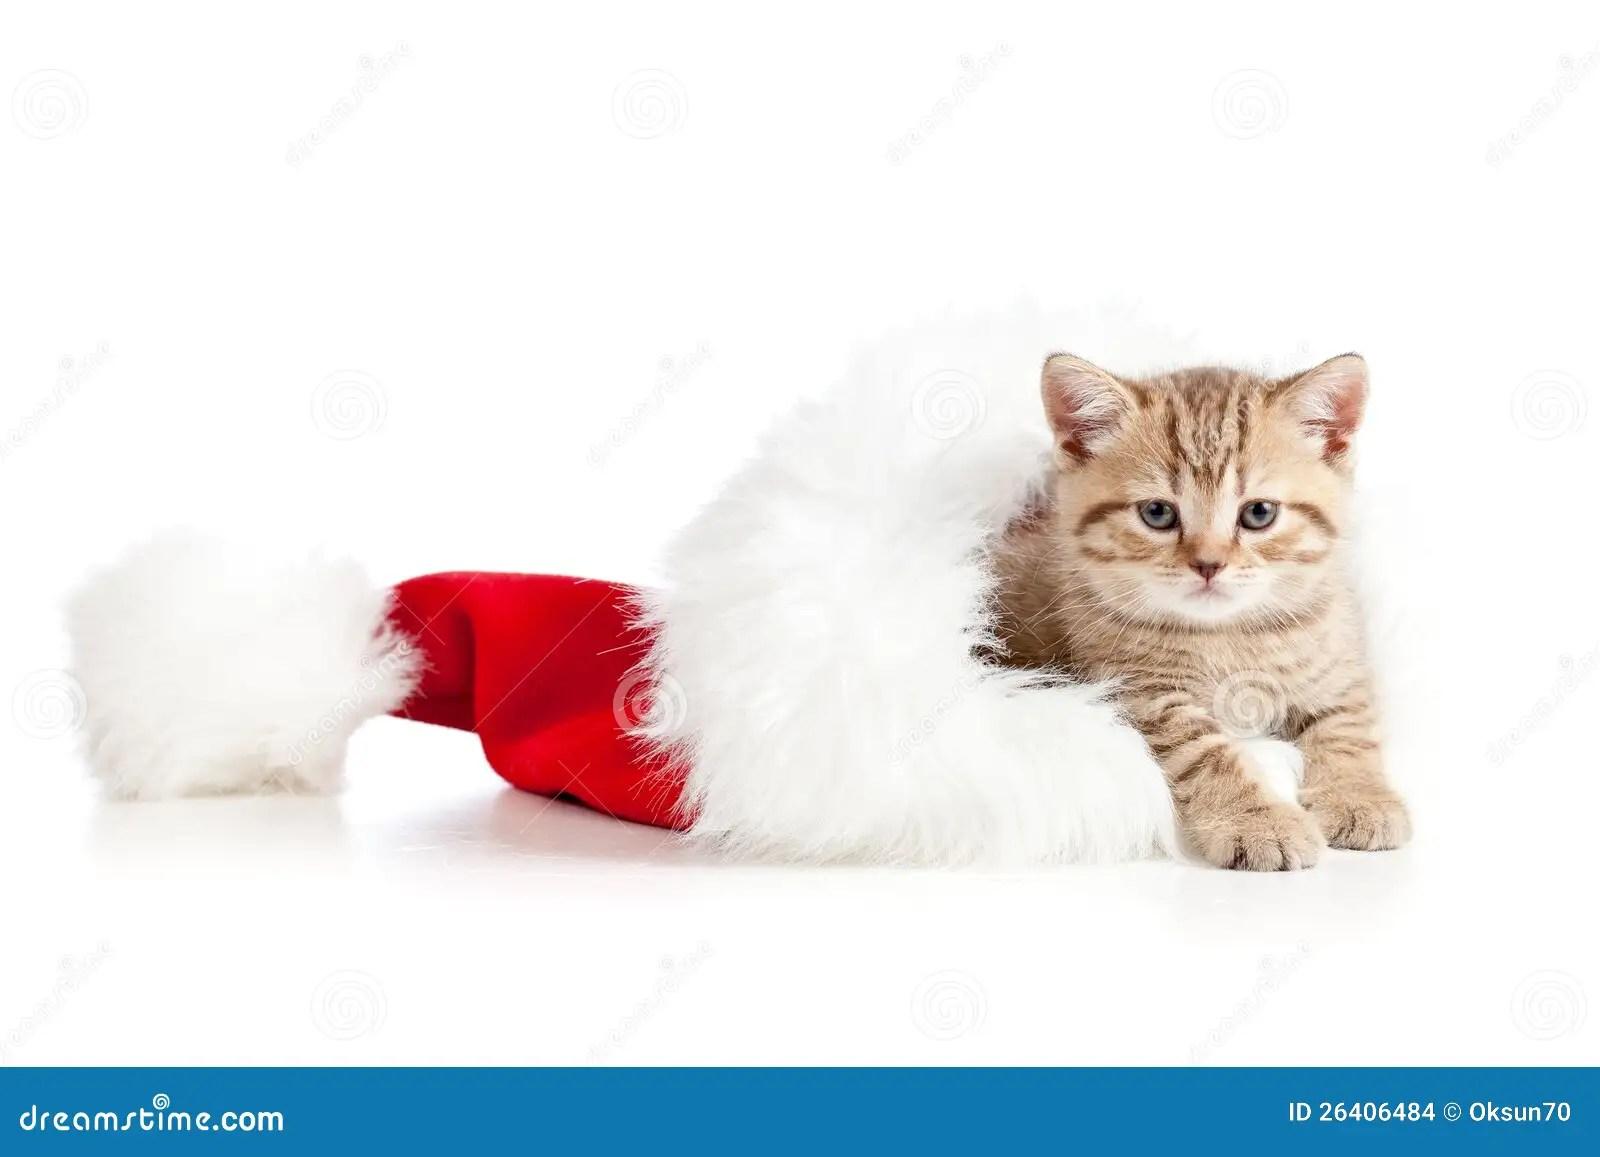 Cute Little Gray Cat For Wallpaper Little Cat Kitten In A Santa Claus Hat Stock Images